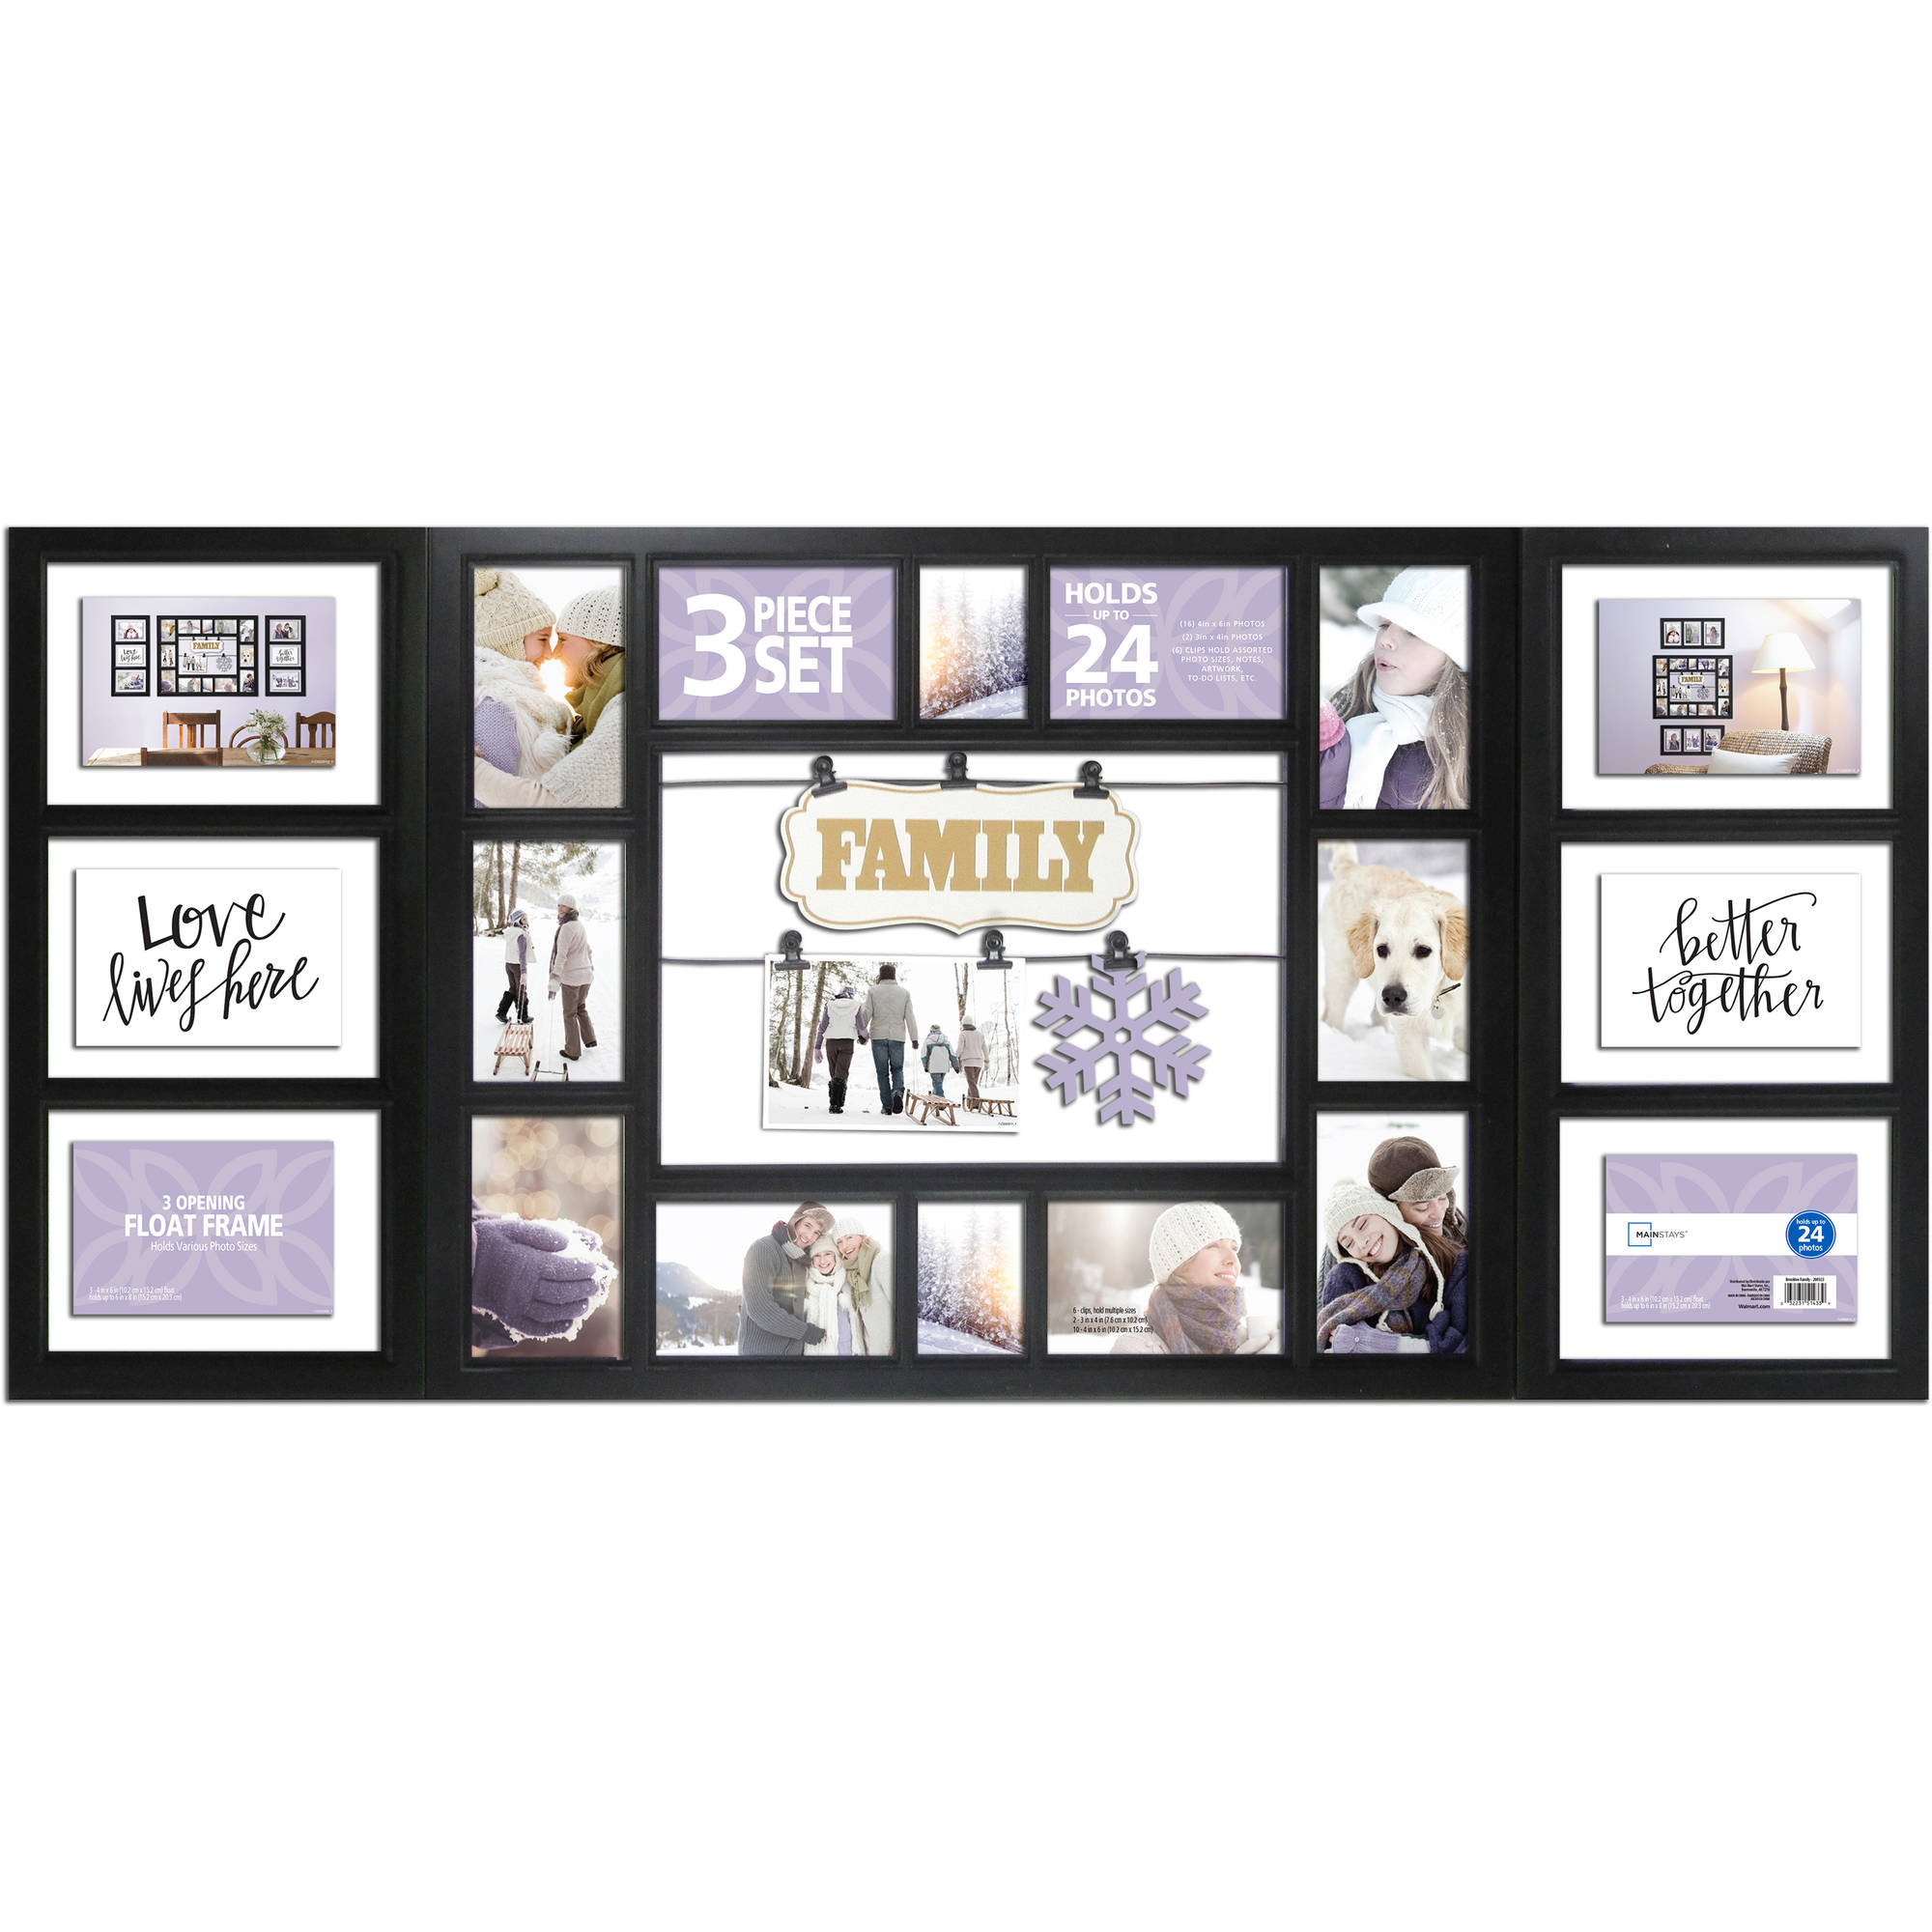 Mainstays 3-Piece Frame Set, 24-Opening Black, Family - Walmart.com